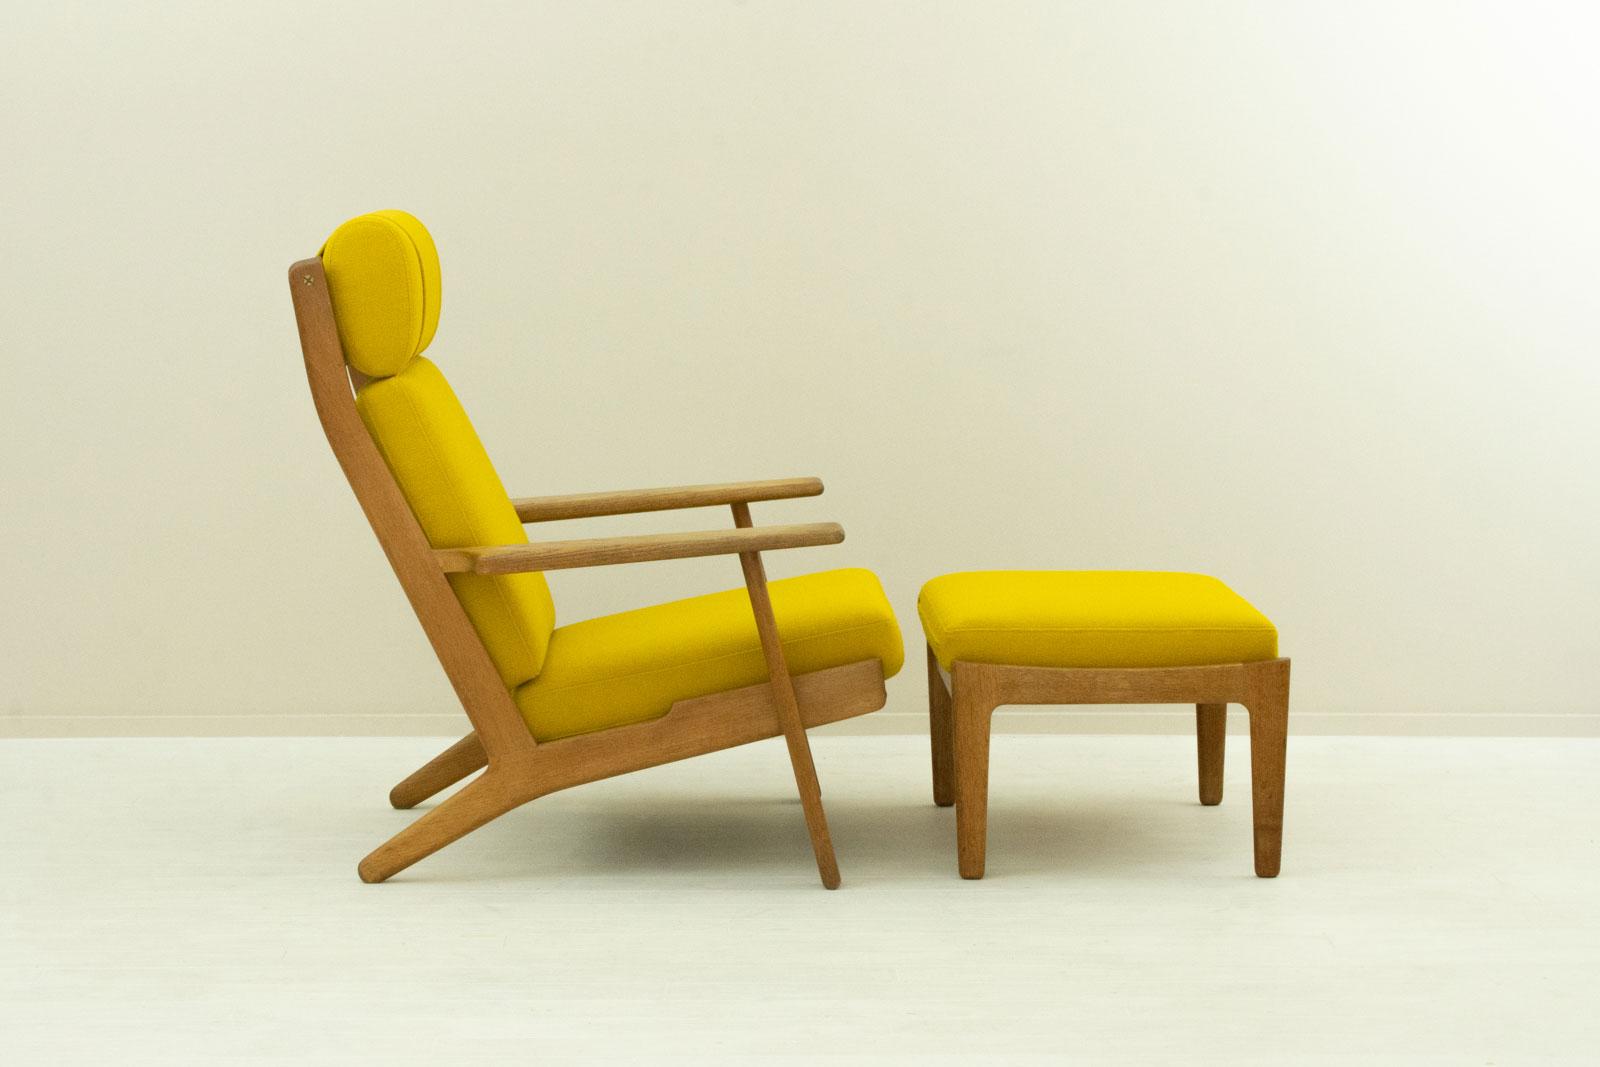 GE290A High back Chair + Ottoman by Hans J Wegner